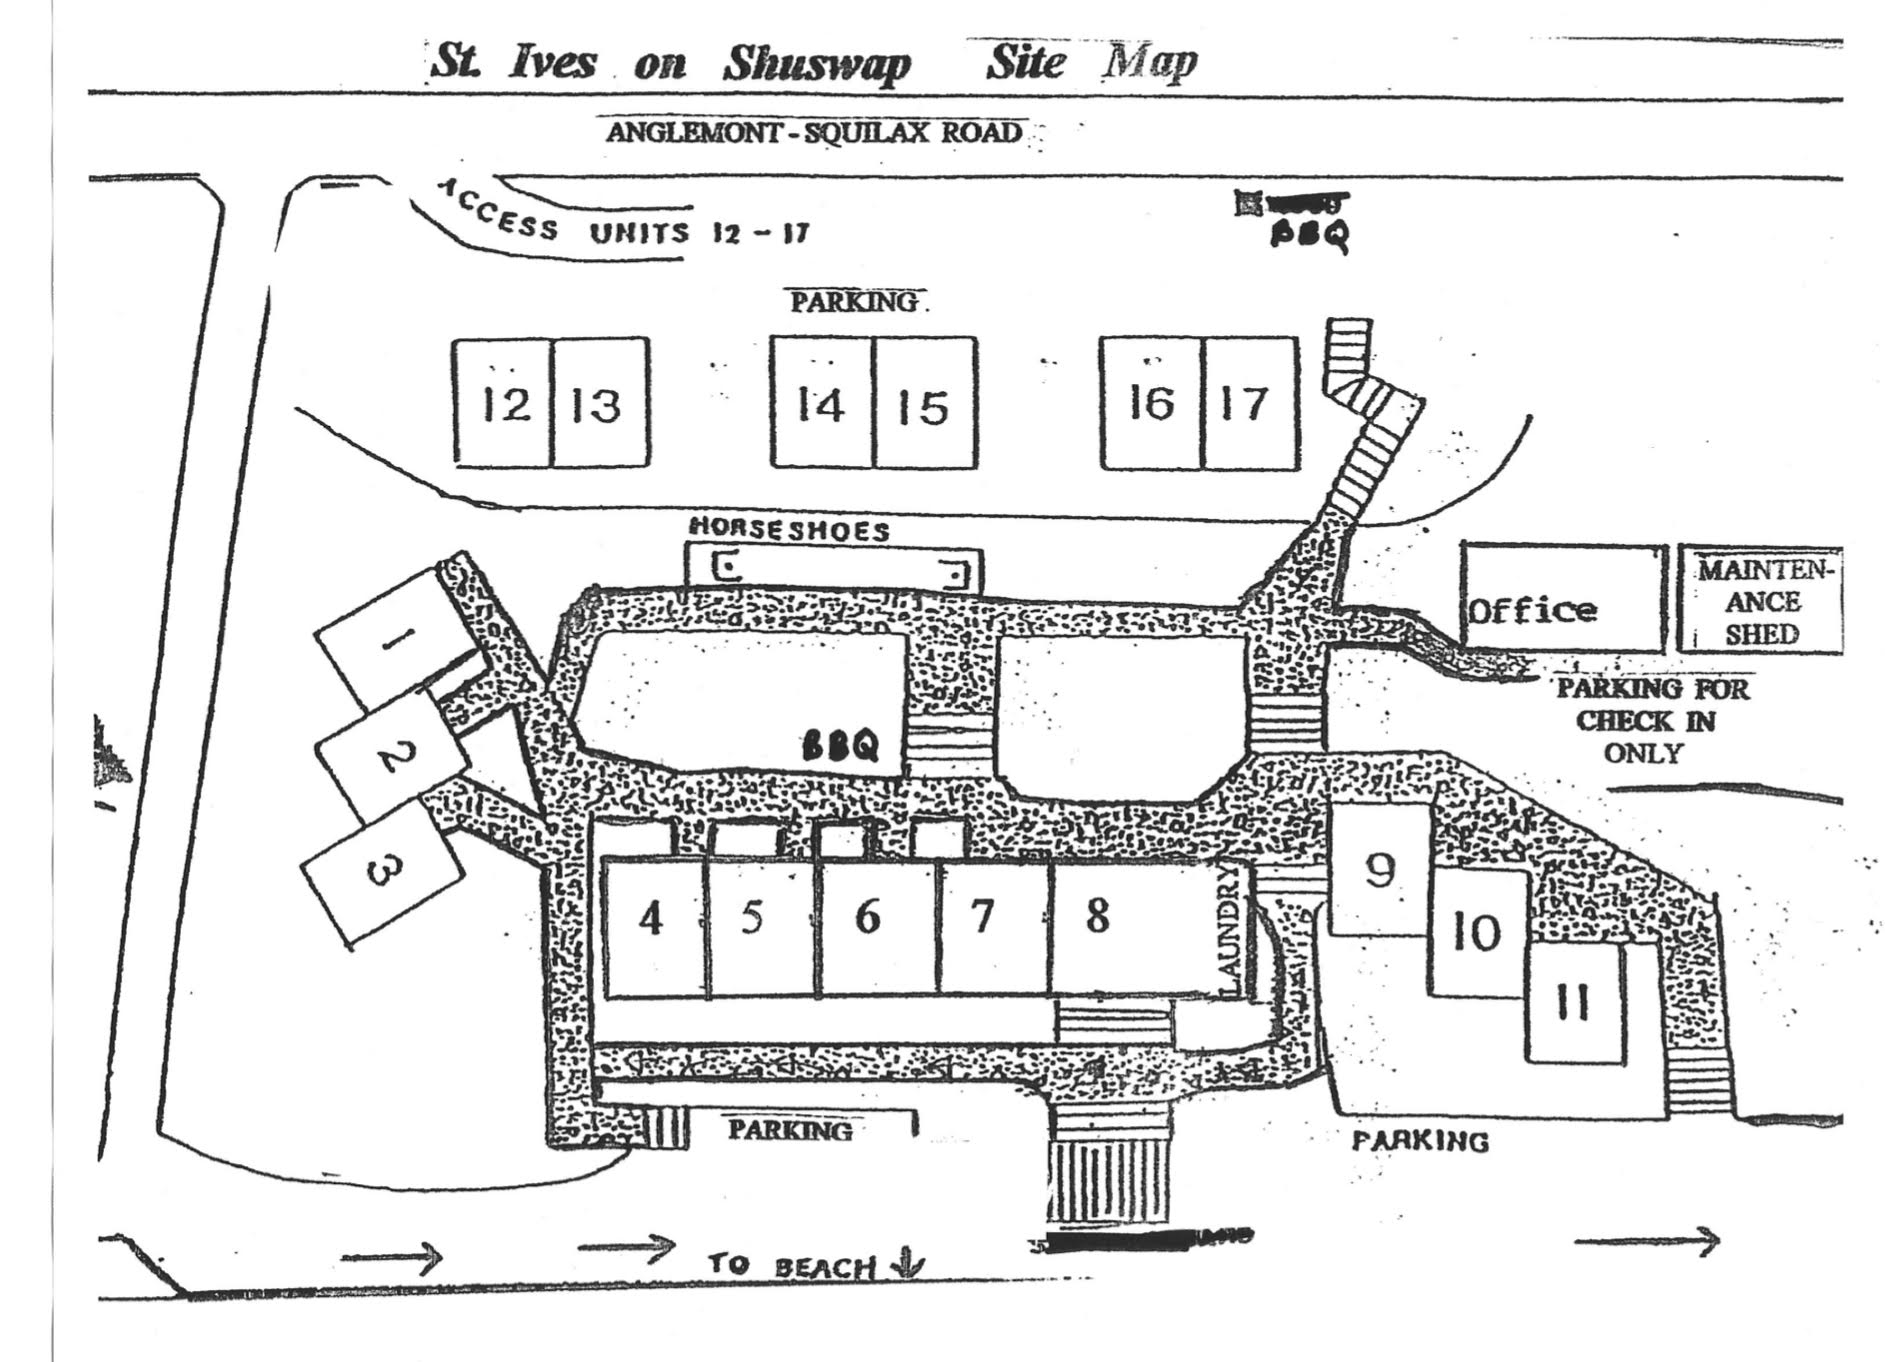 St. Ives on Shuswap image